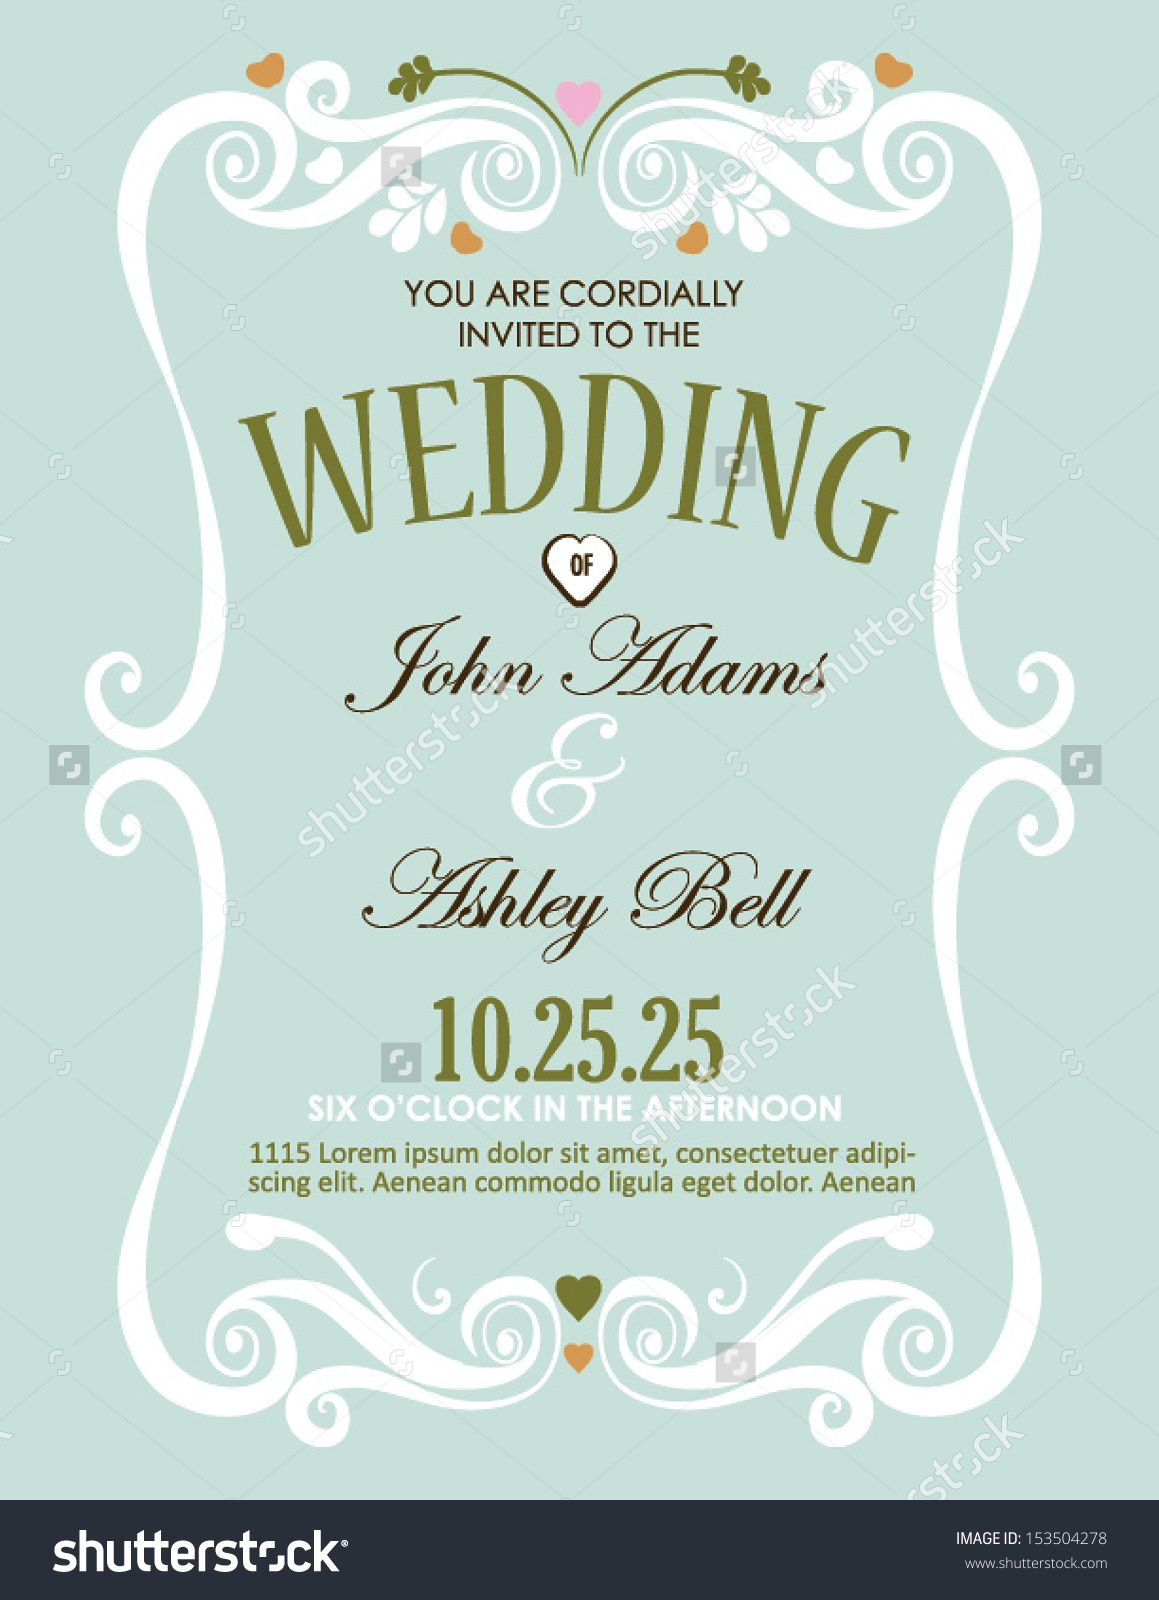 Cool Create Easy Wedding Invitation Designs Free Templates